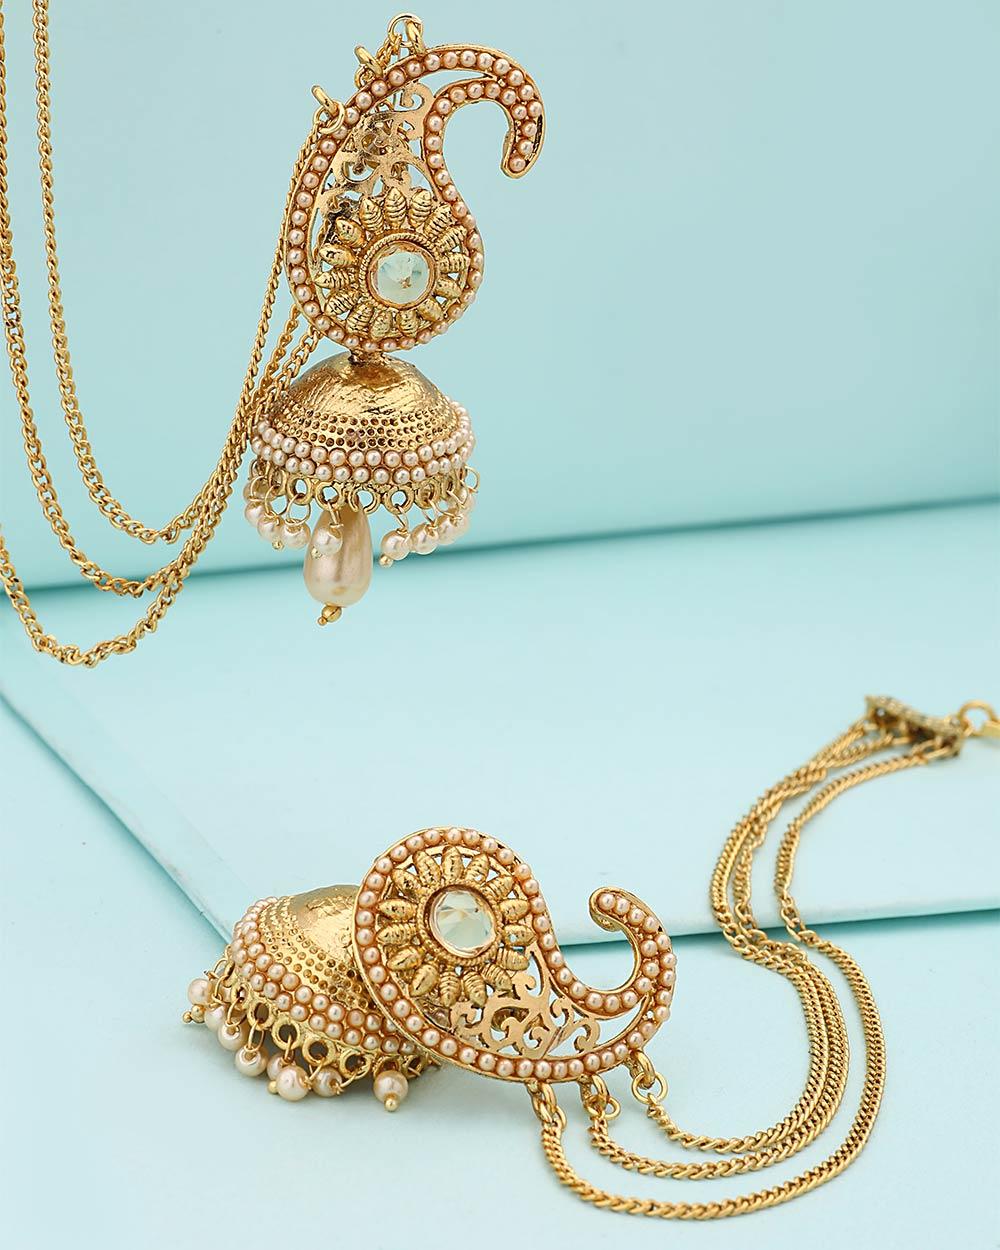 Buy Beautiful Ethnic-Style Jhumka Earrings with Sahara Chain ...